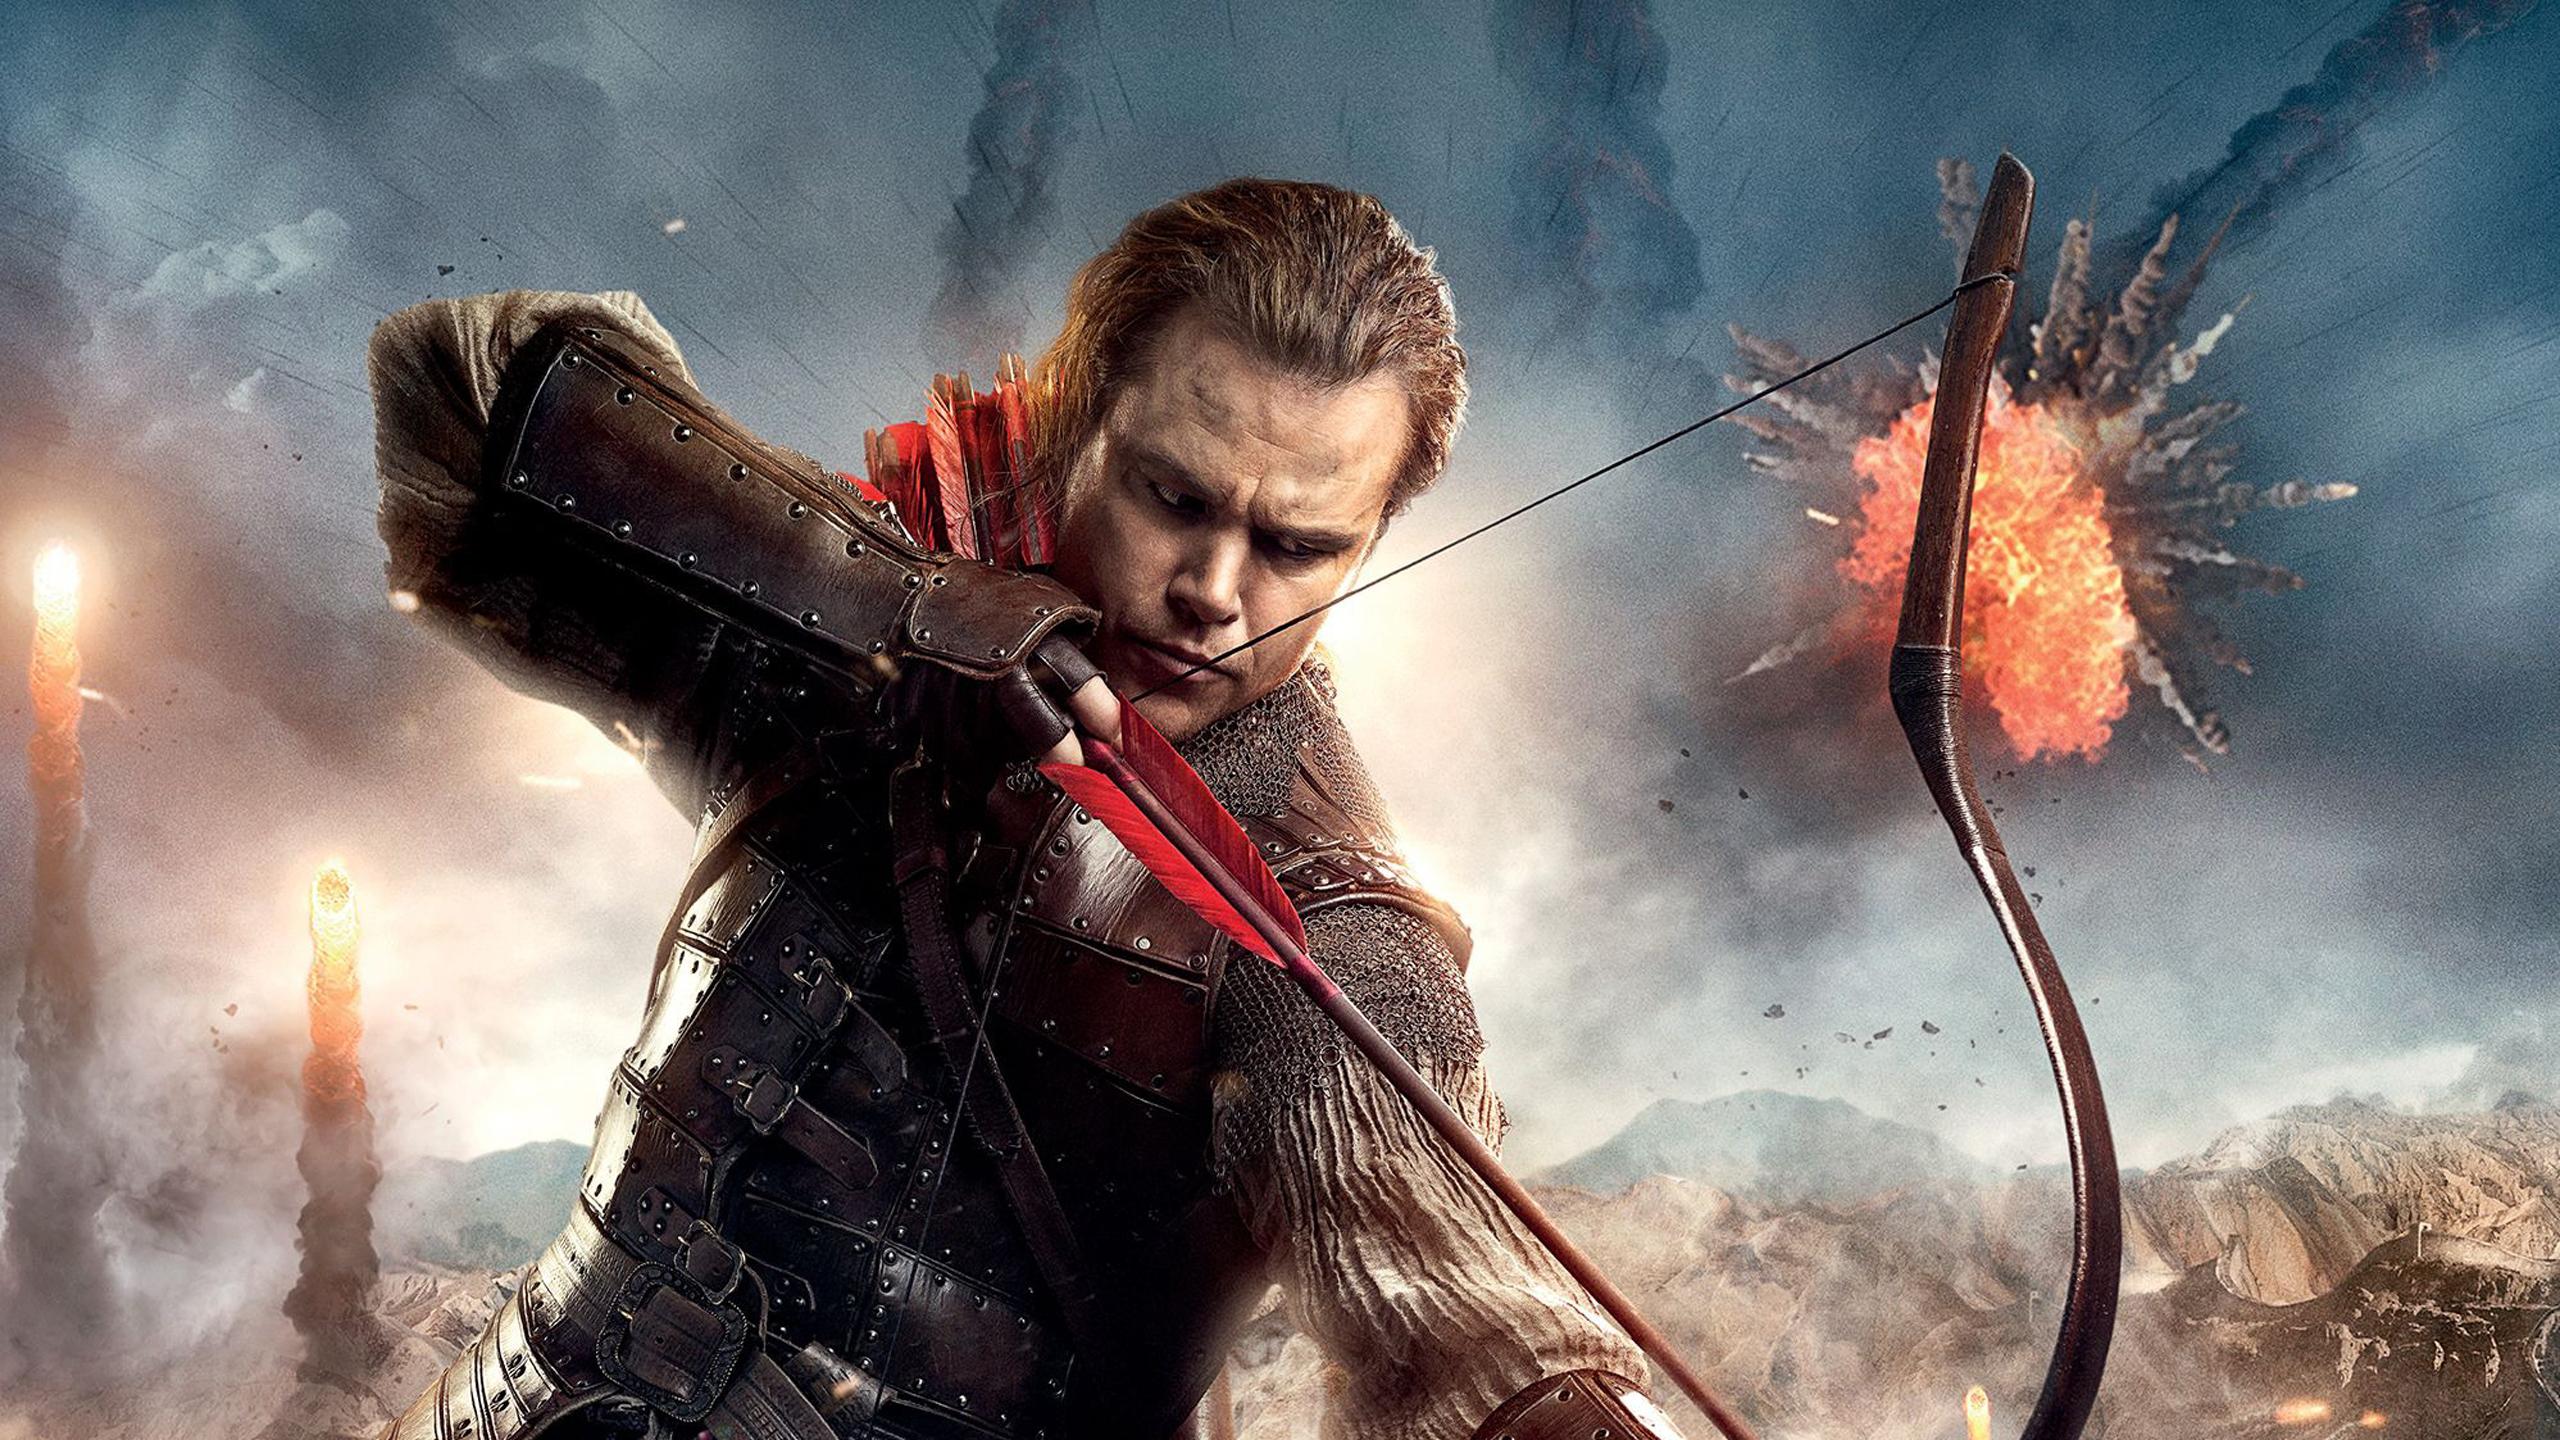 2560x1440 The Great Wall Matt Damon 2017 Movie 1440p